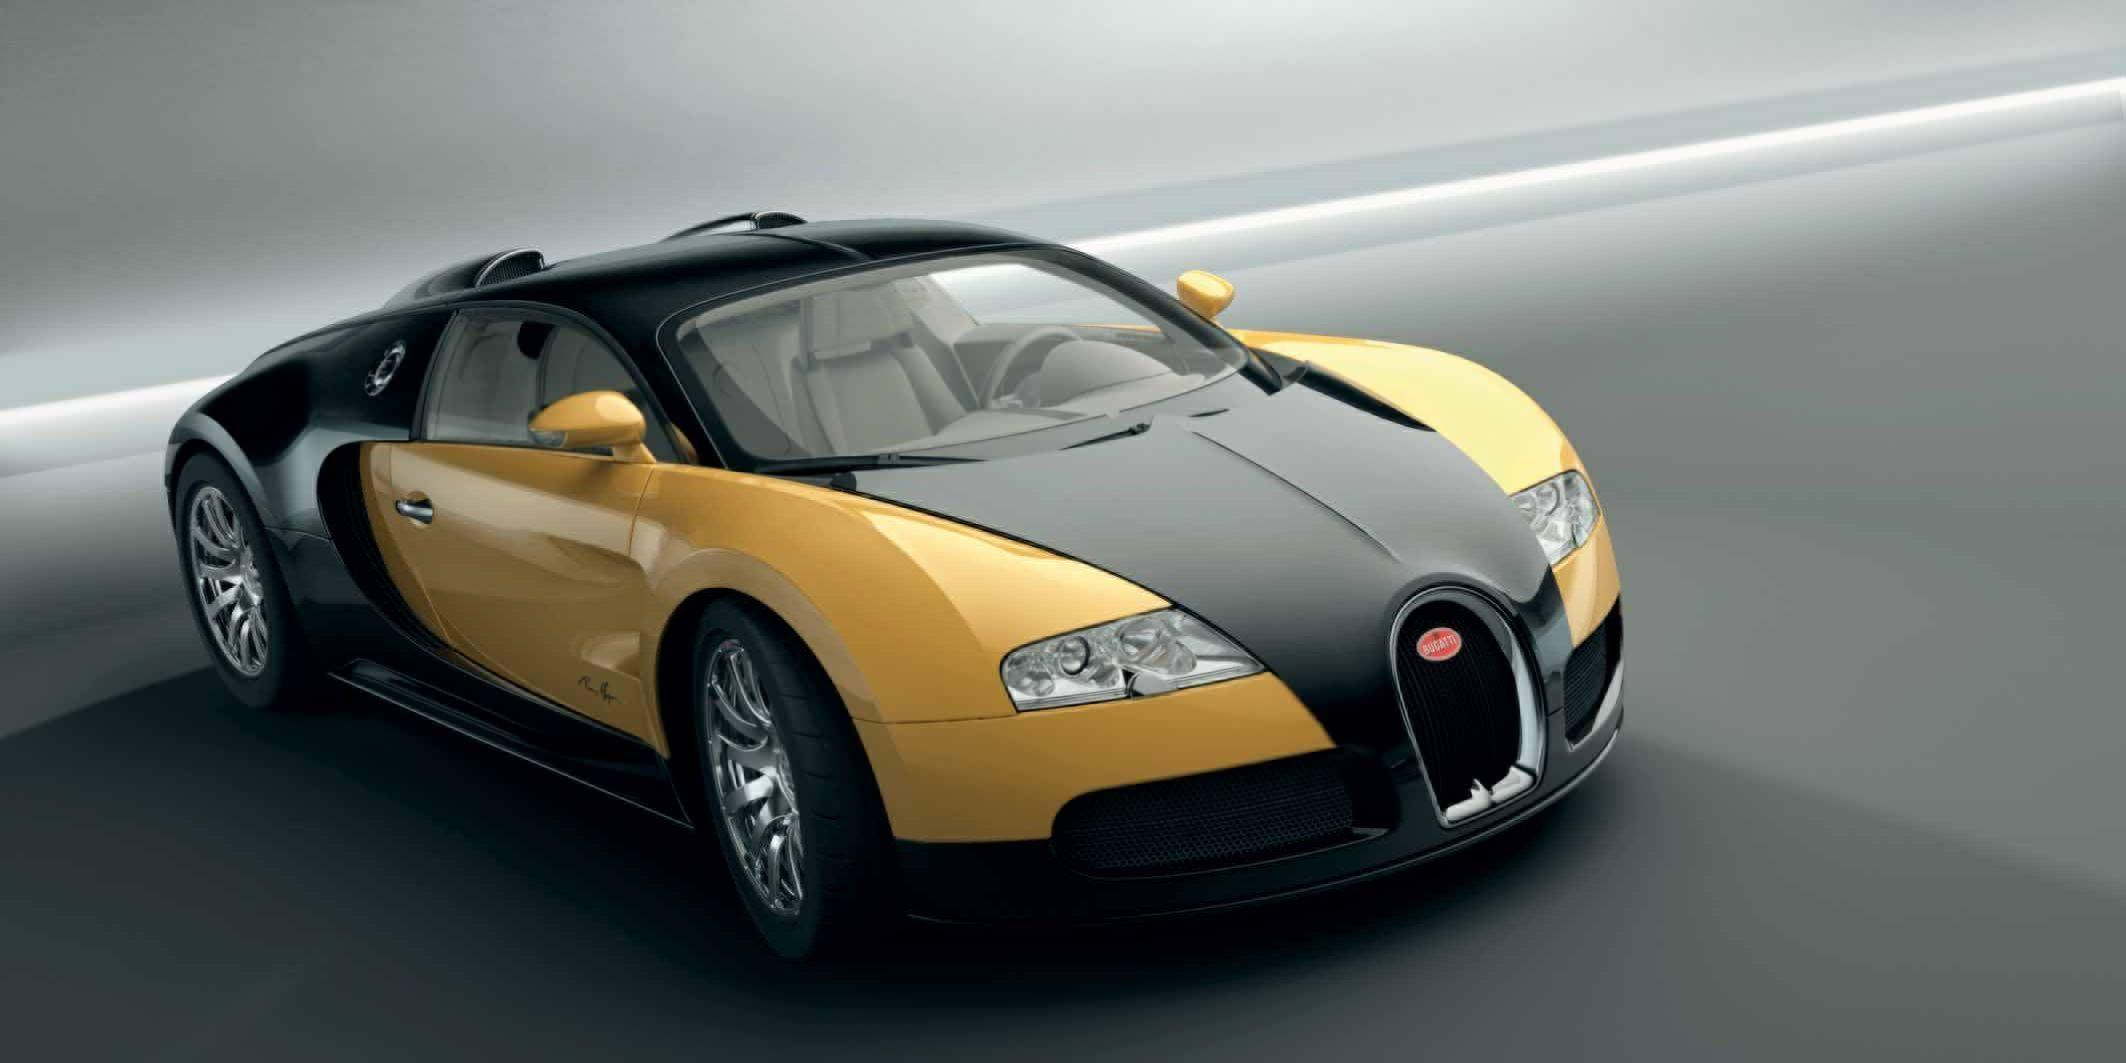 bugatti veyron 2015 supercar wallpaper wallpapers hd wallpaper - Bugatti 2016 Gold